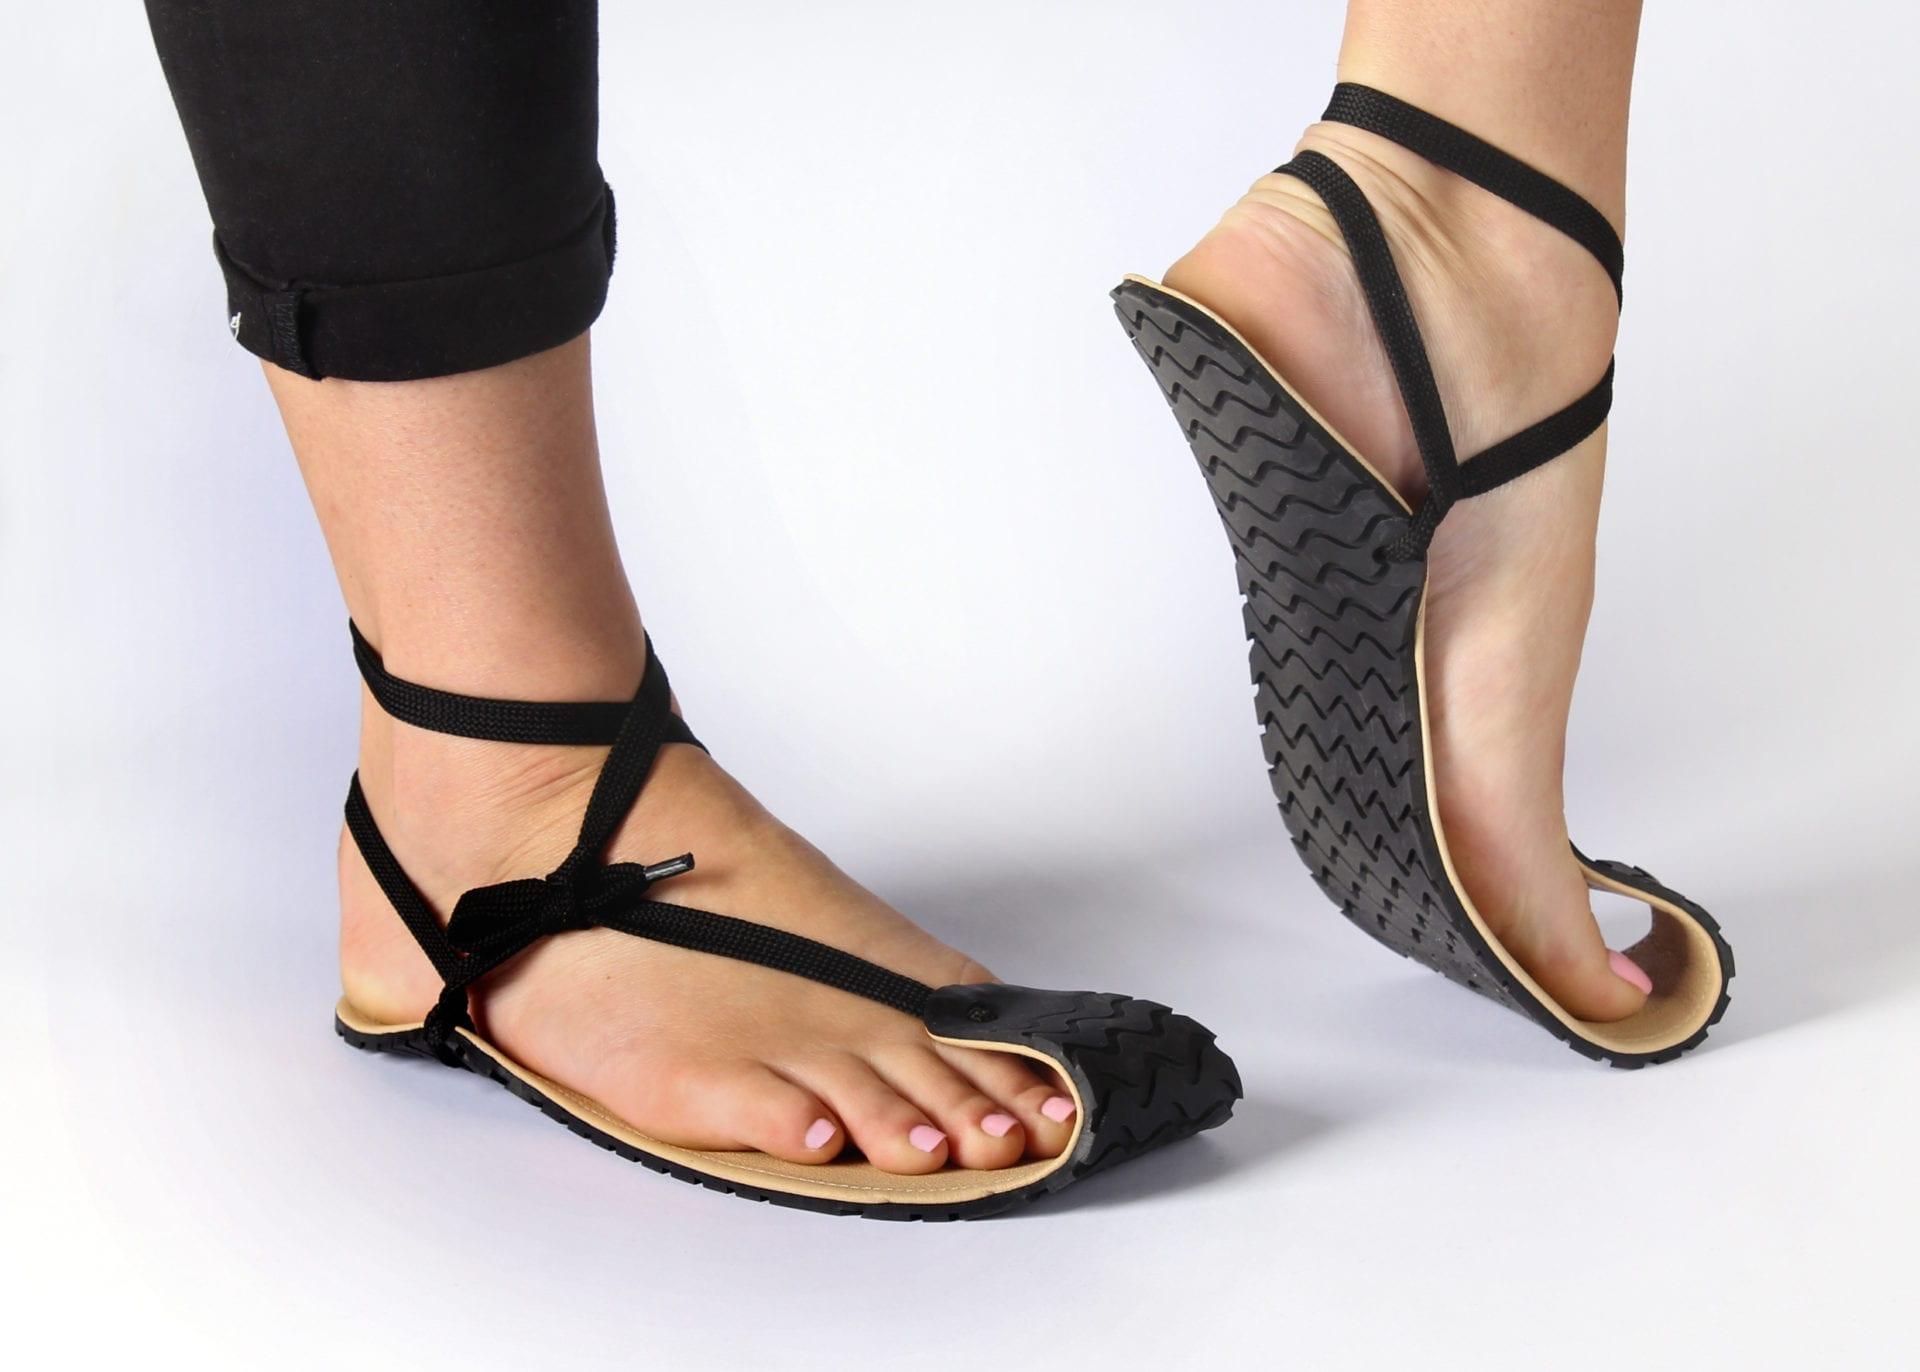 Magical Shoes CABALLO BLANCO- HUARACHE SANDALS picture 5